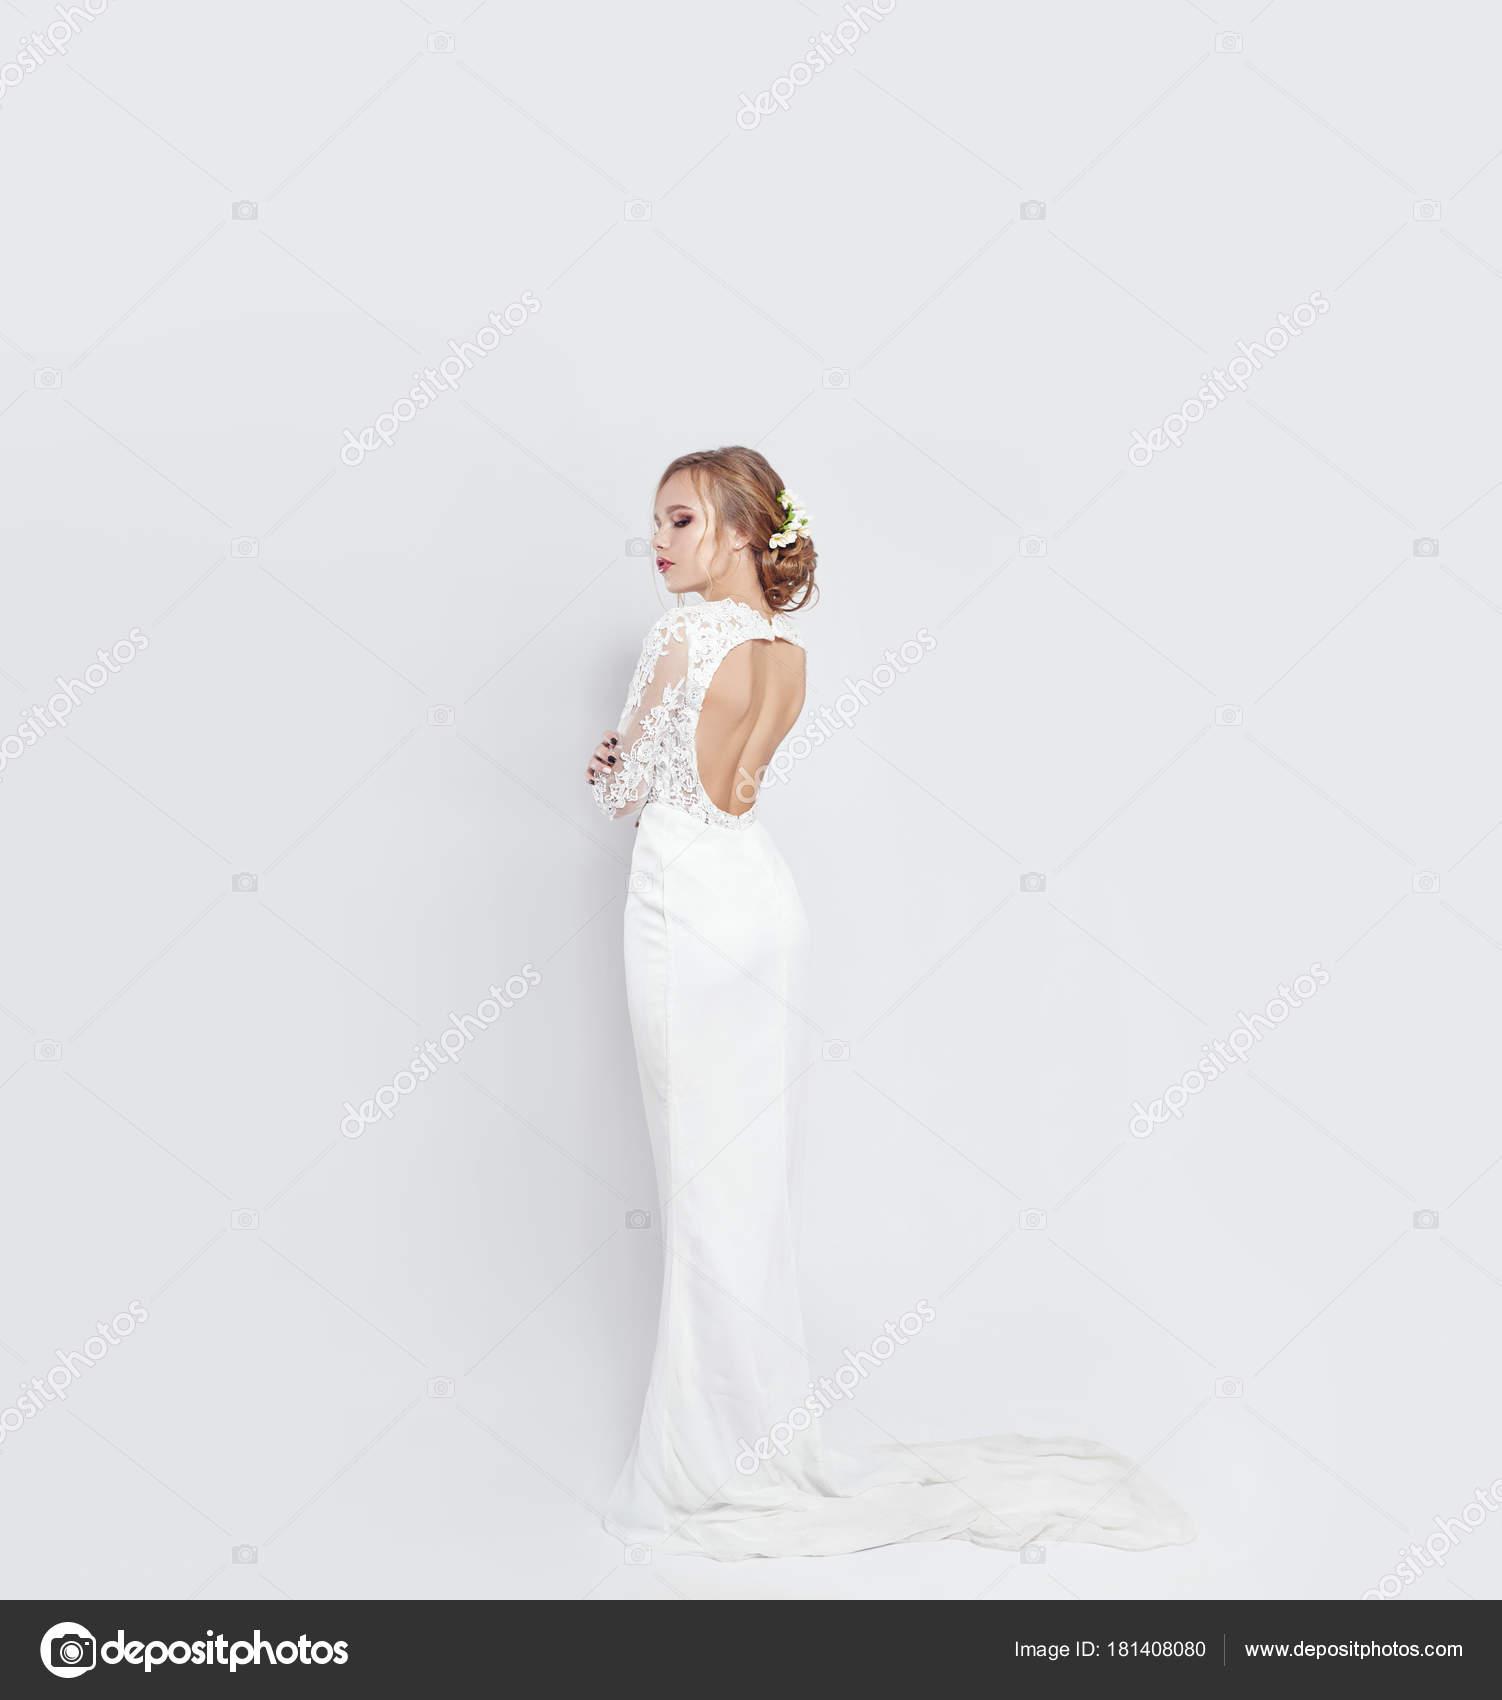 8234dbfcf032 Νύφη στο μακρύ λευκό νυφικό φόρεμα σε λευκό φόντο. Πολυτελές νυφικό στο  σώμα μιας γυναίκας